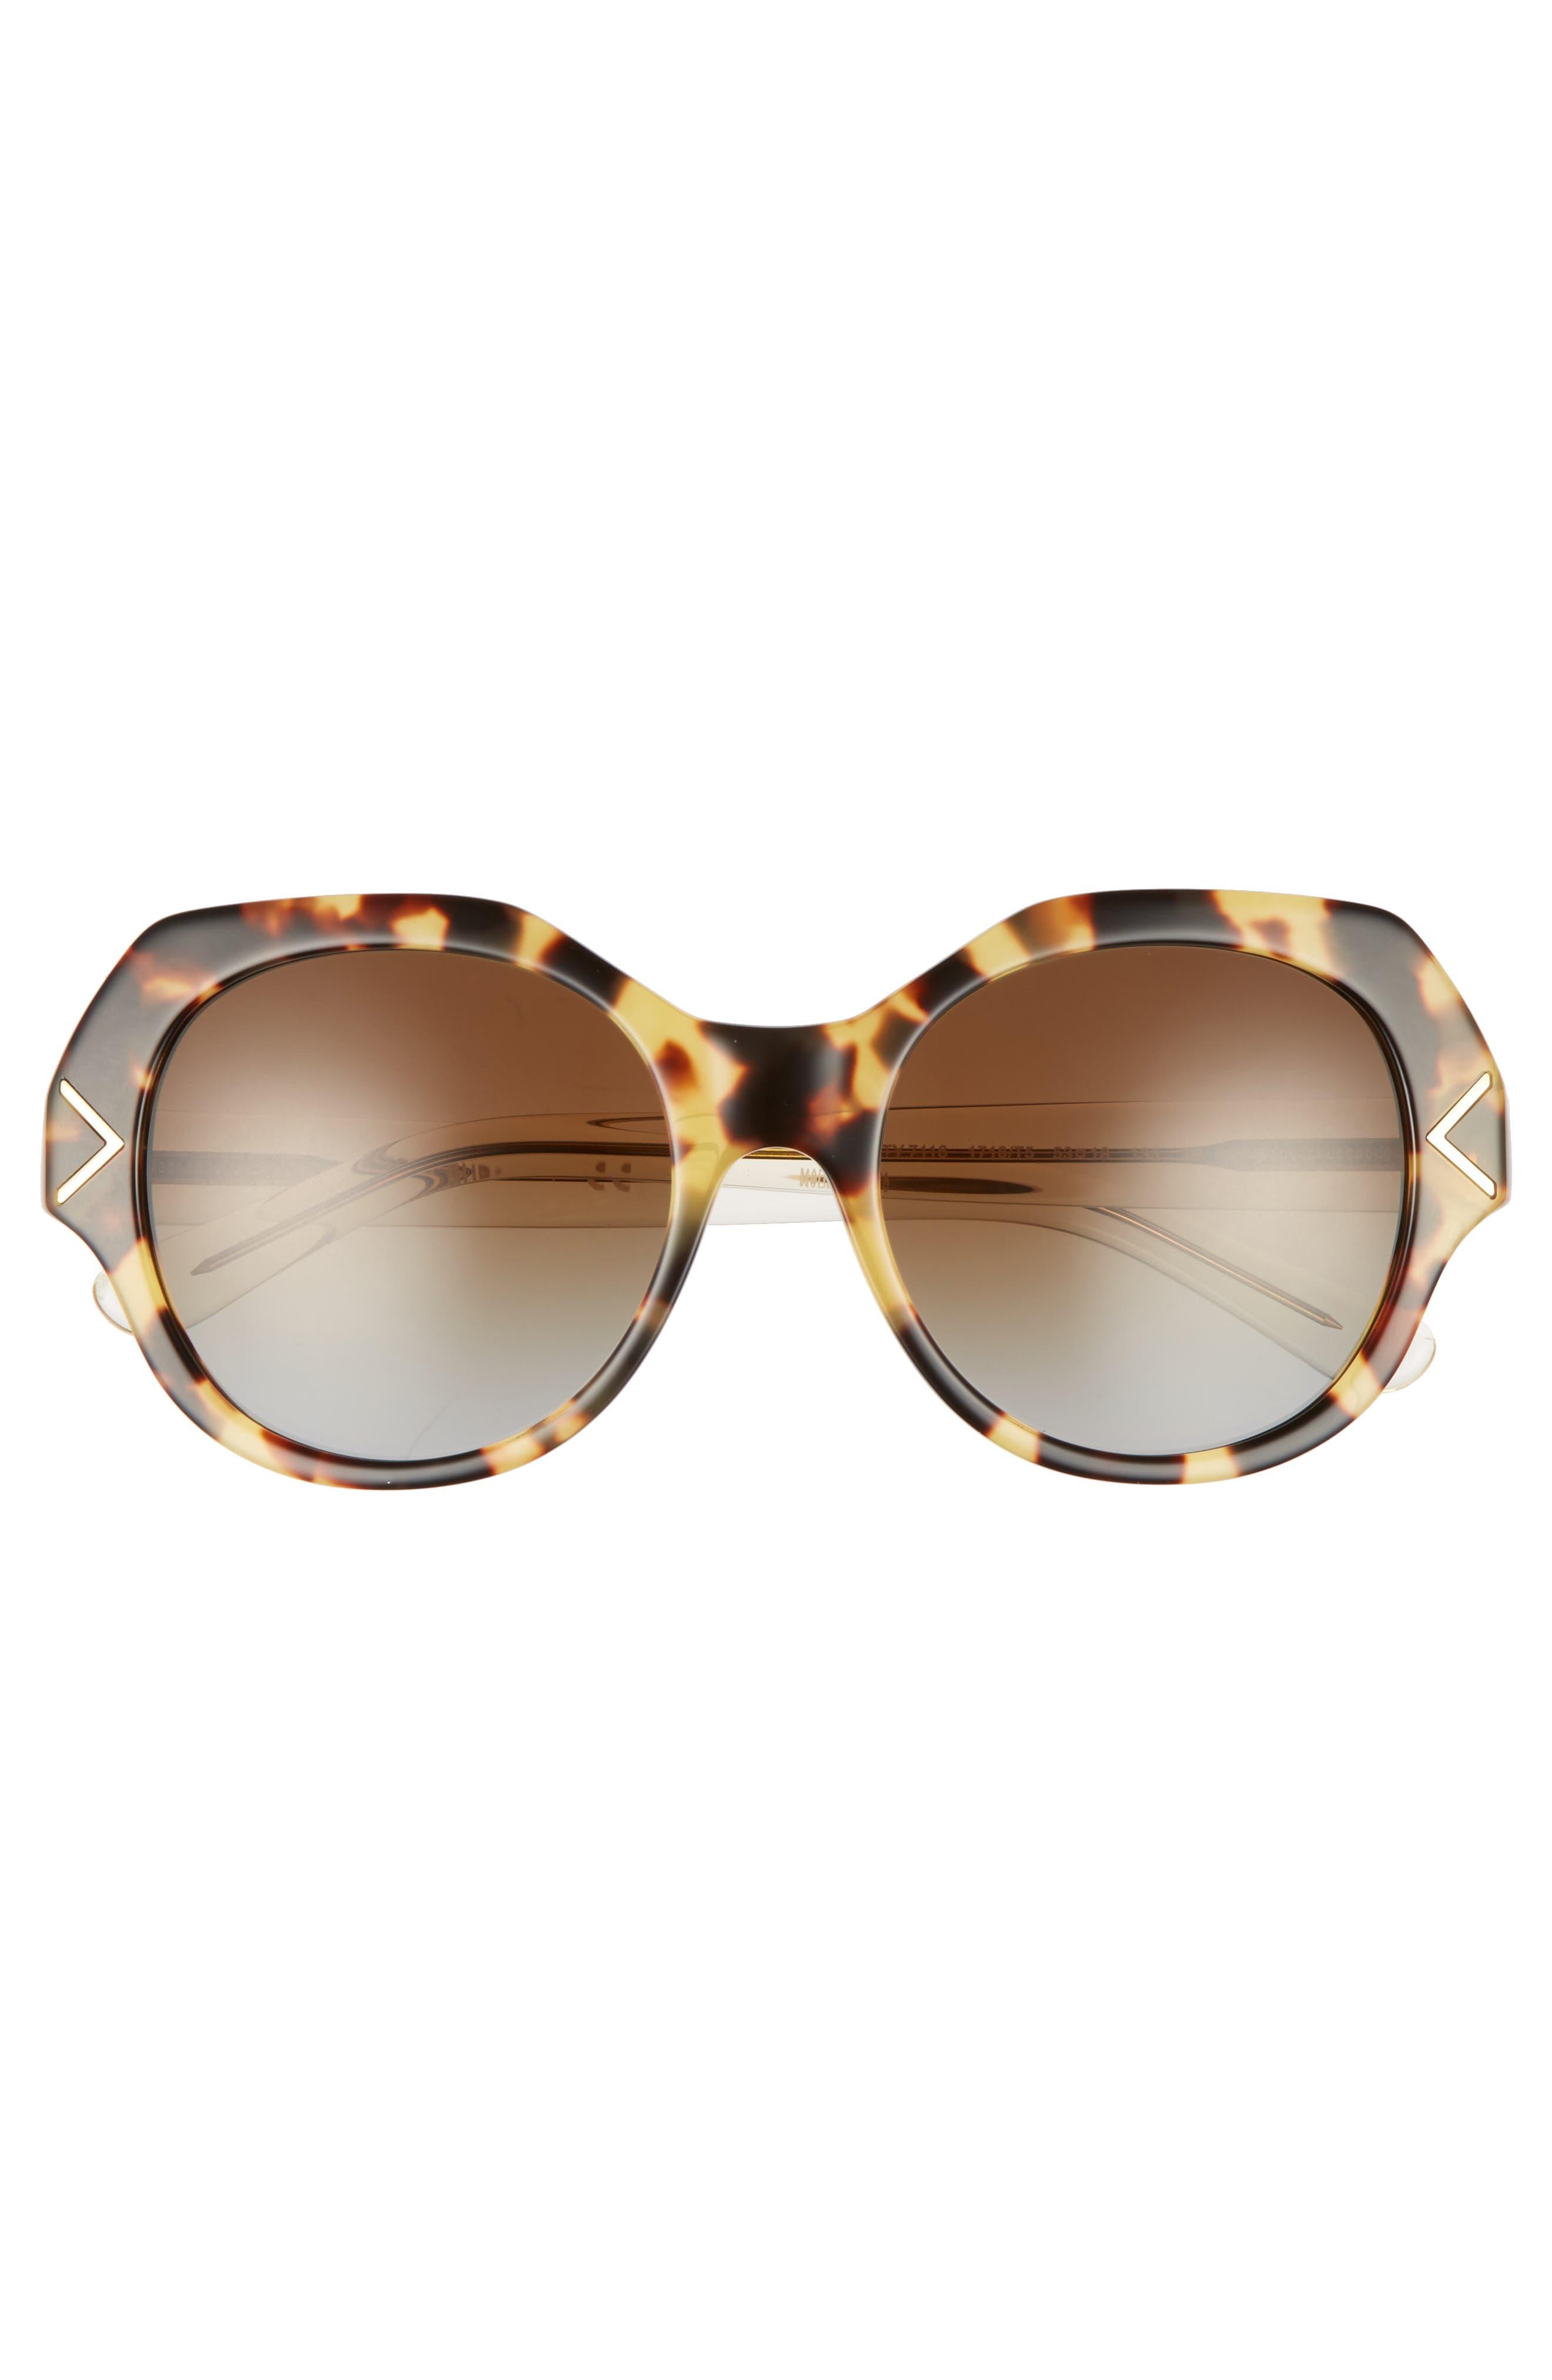 53mm Polarized Gradient Geometric Sunglasses,                             Alternate thumbnail 5, color,